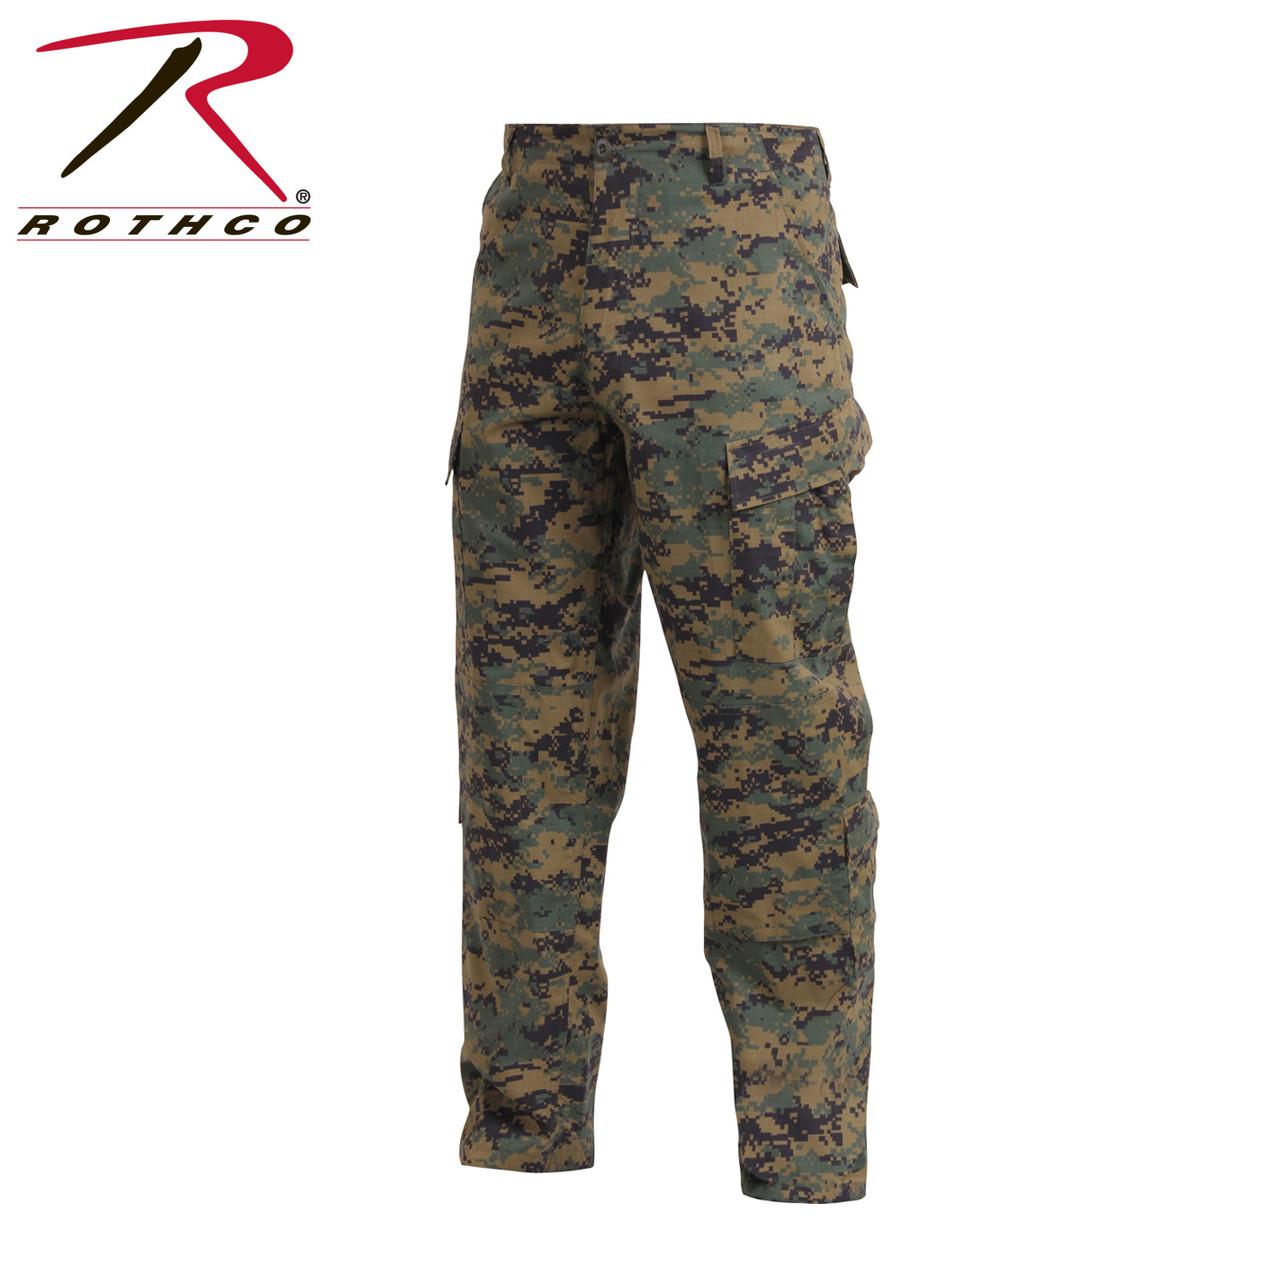 Rothco Woodland Digital Combat Uniform Pants